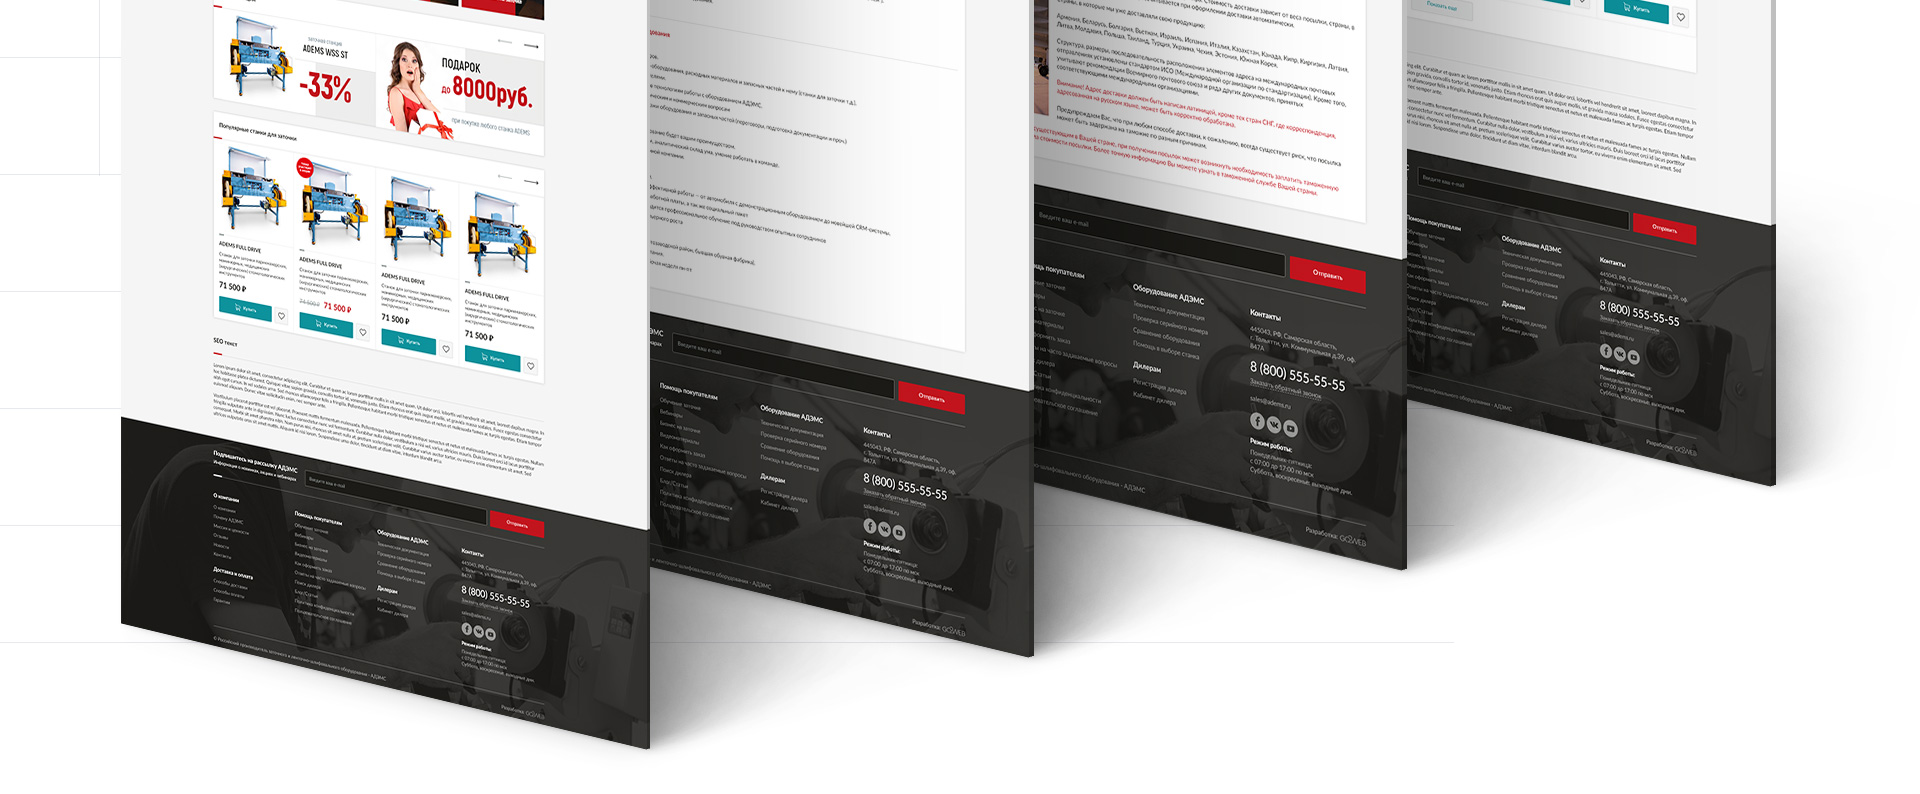 Дизайн интернет-магазина для Адэмс